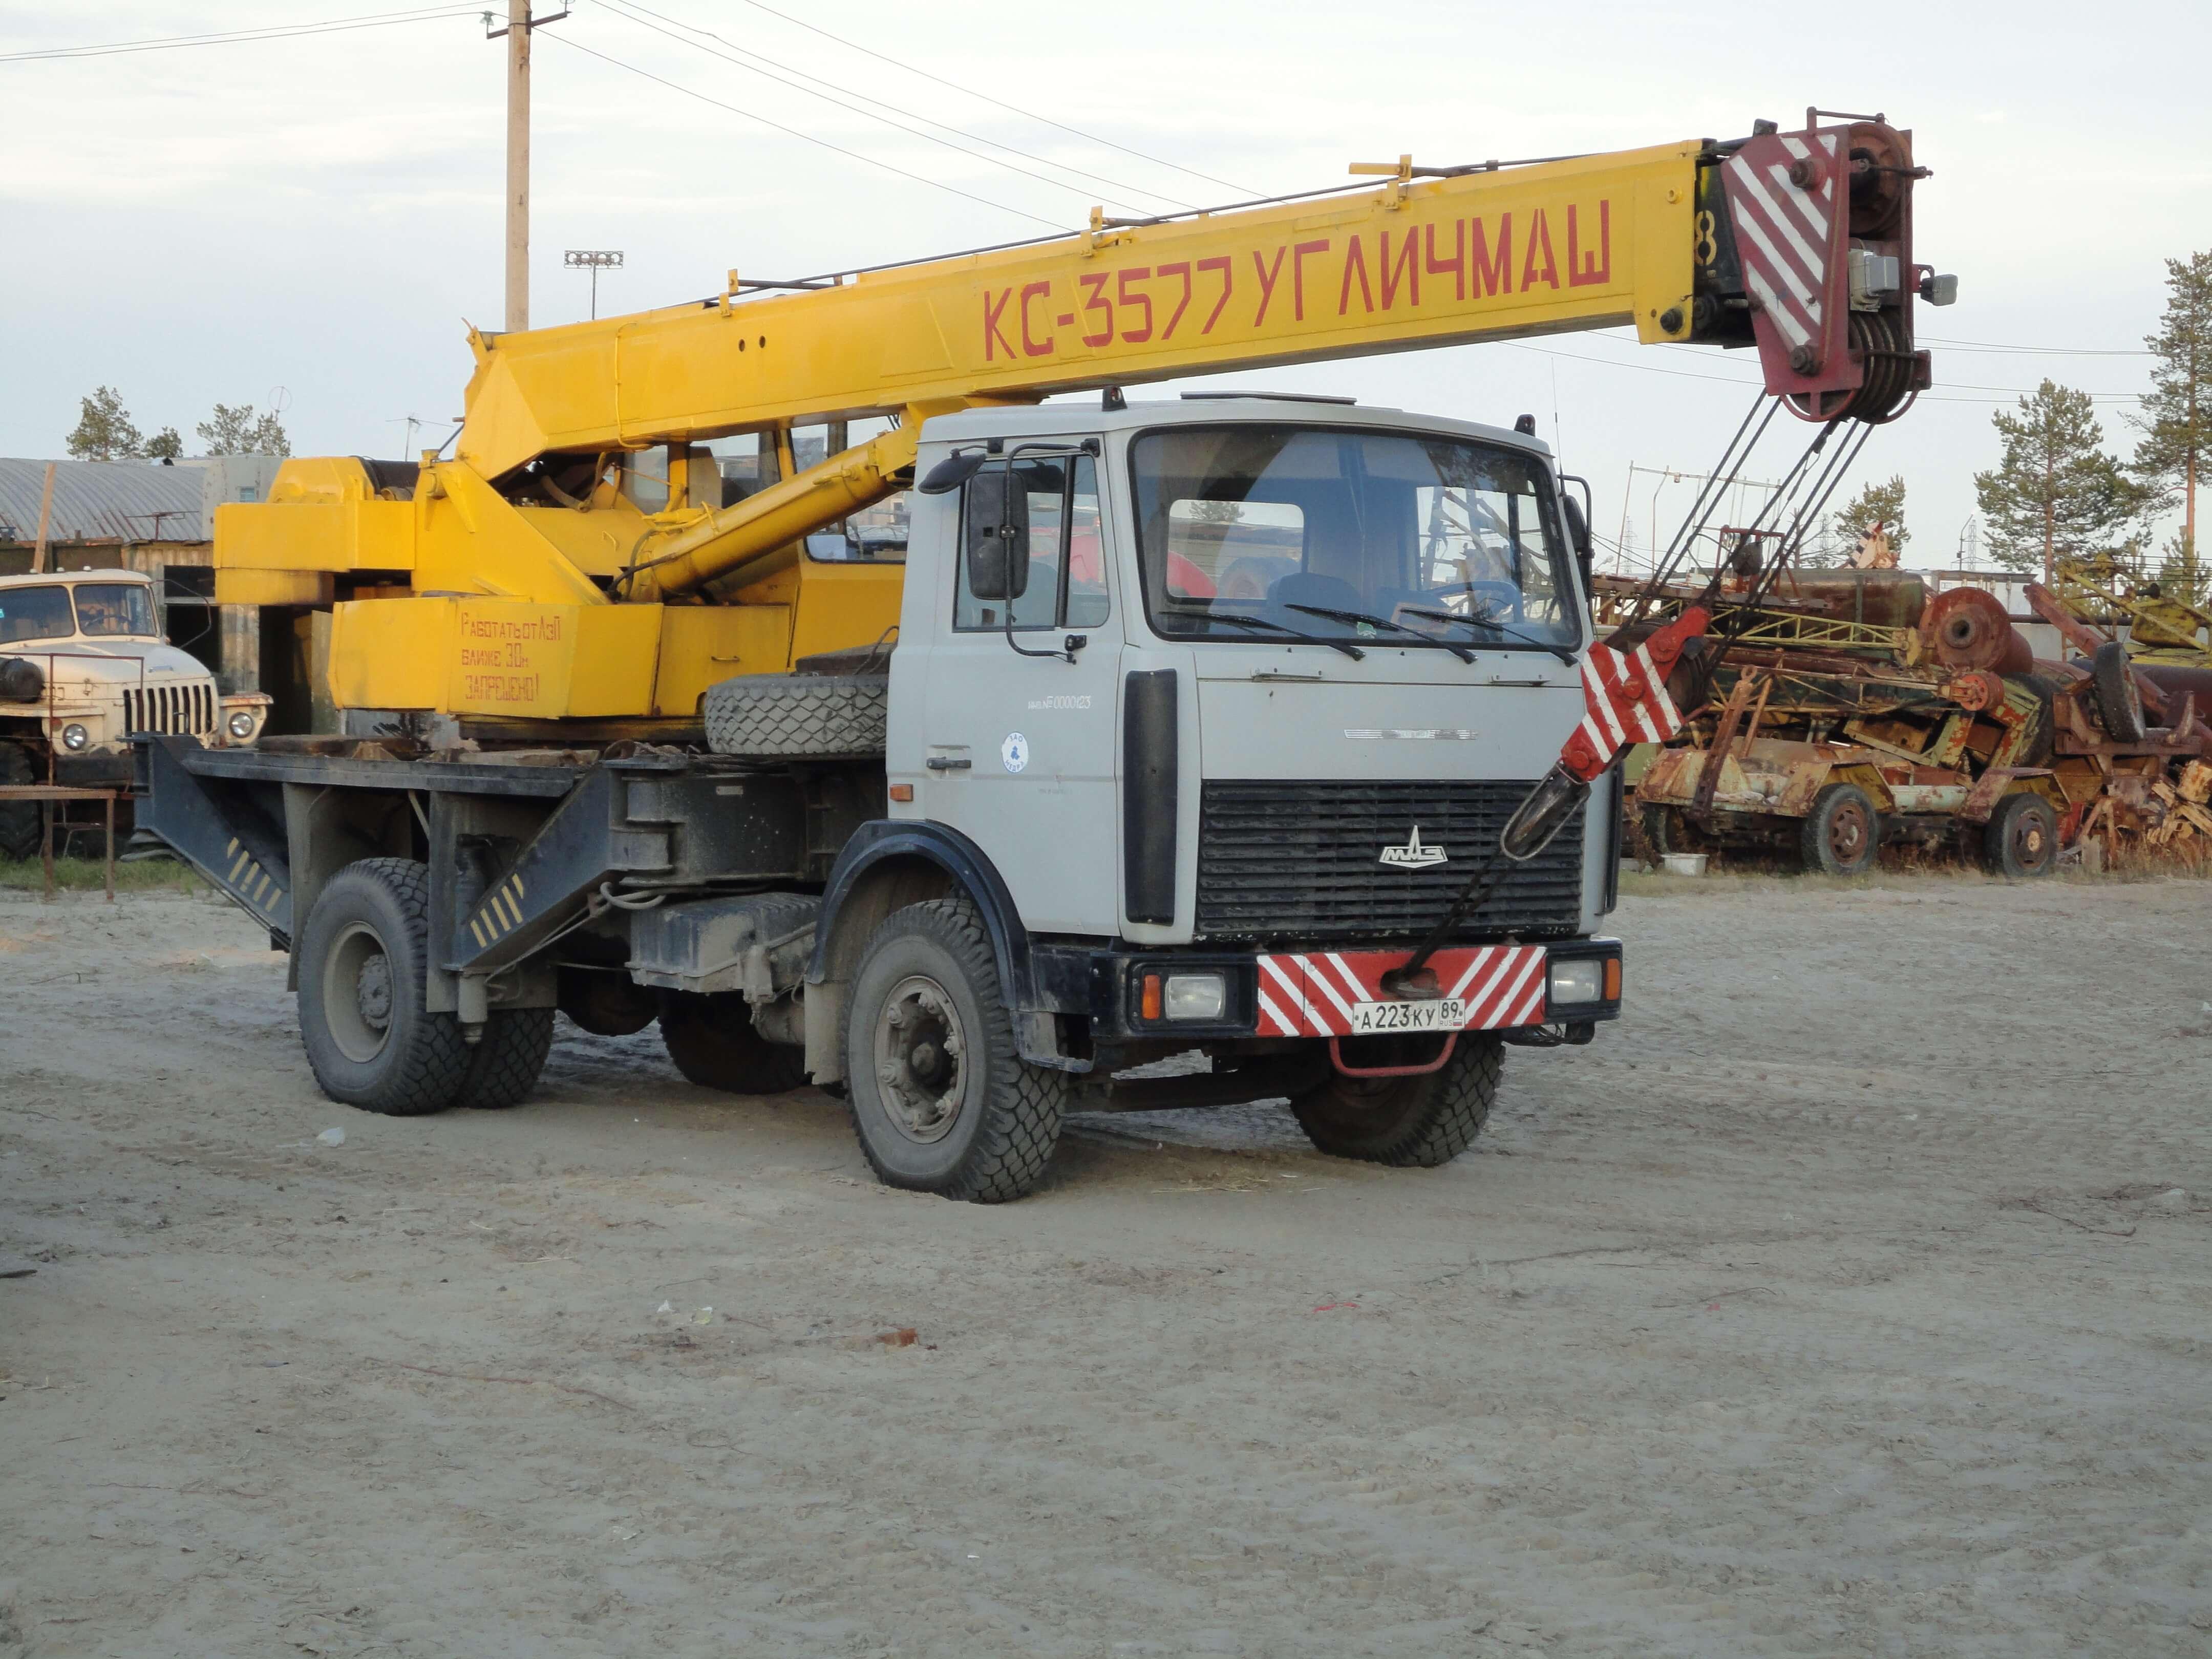 Автокран Угличмаш на шасси автомобиля МАЗ 5337